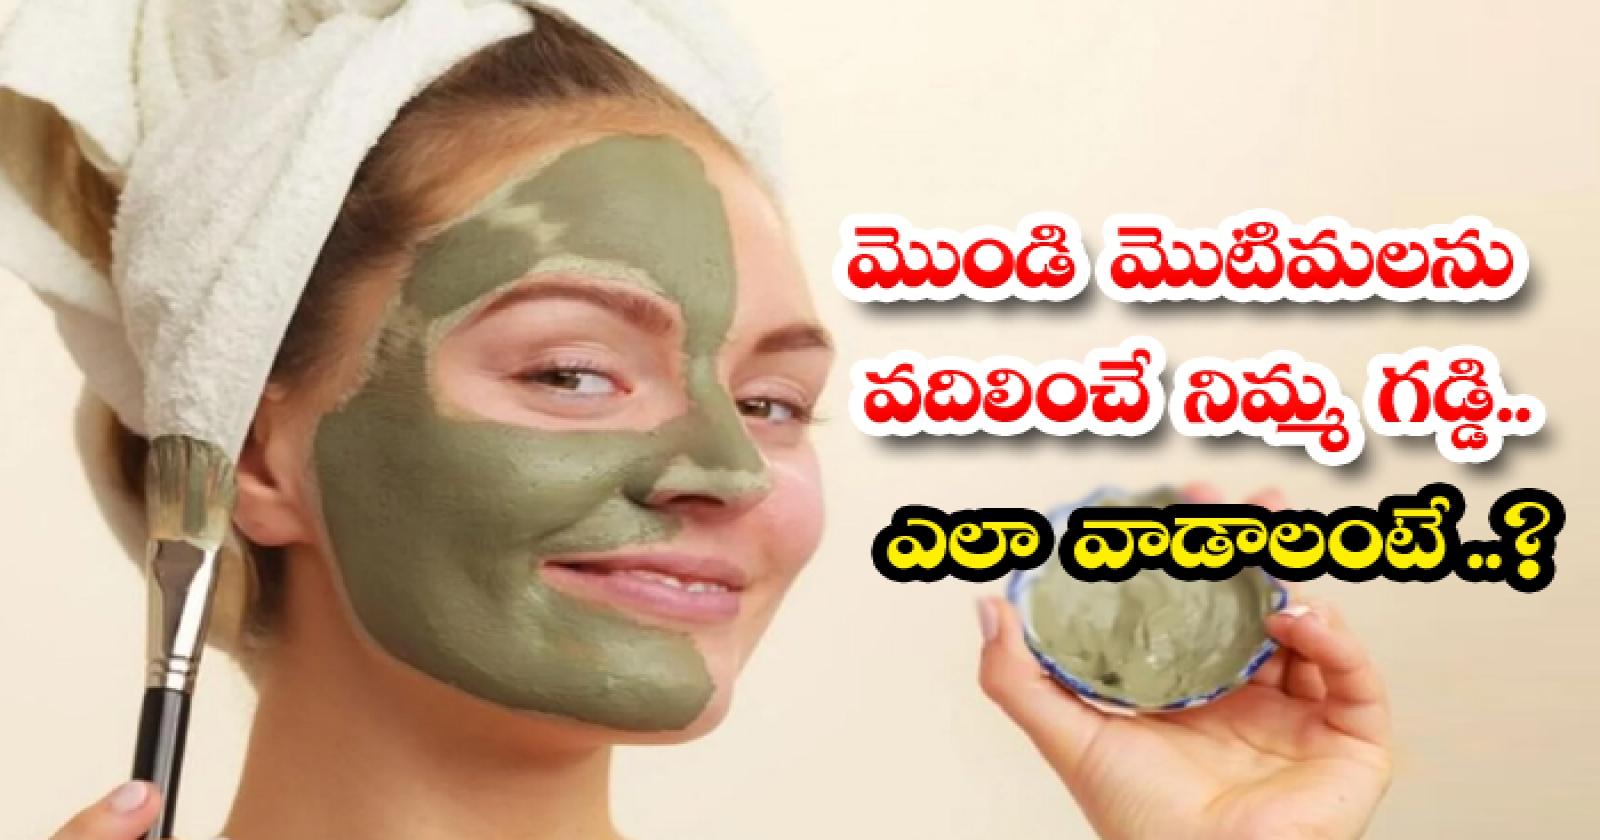 Lemongrass Helps To Reduce Pimples-మొండి మొటిమలను వదిలించే నిమ్మ గడ్డి..ఎలా వాడాలంటే-Latest News - Telugu-Telugu Tollywood Photo Image-TeluguStop.com